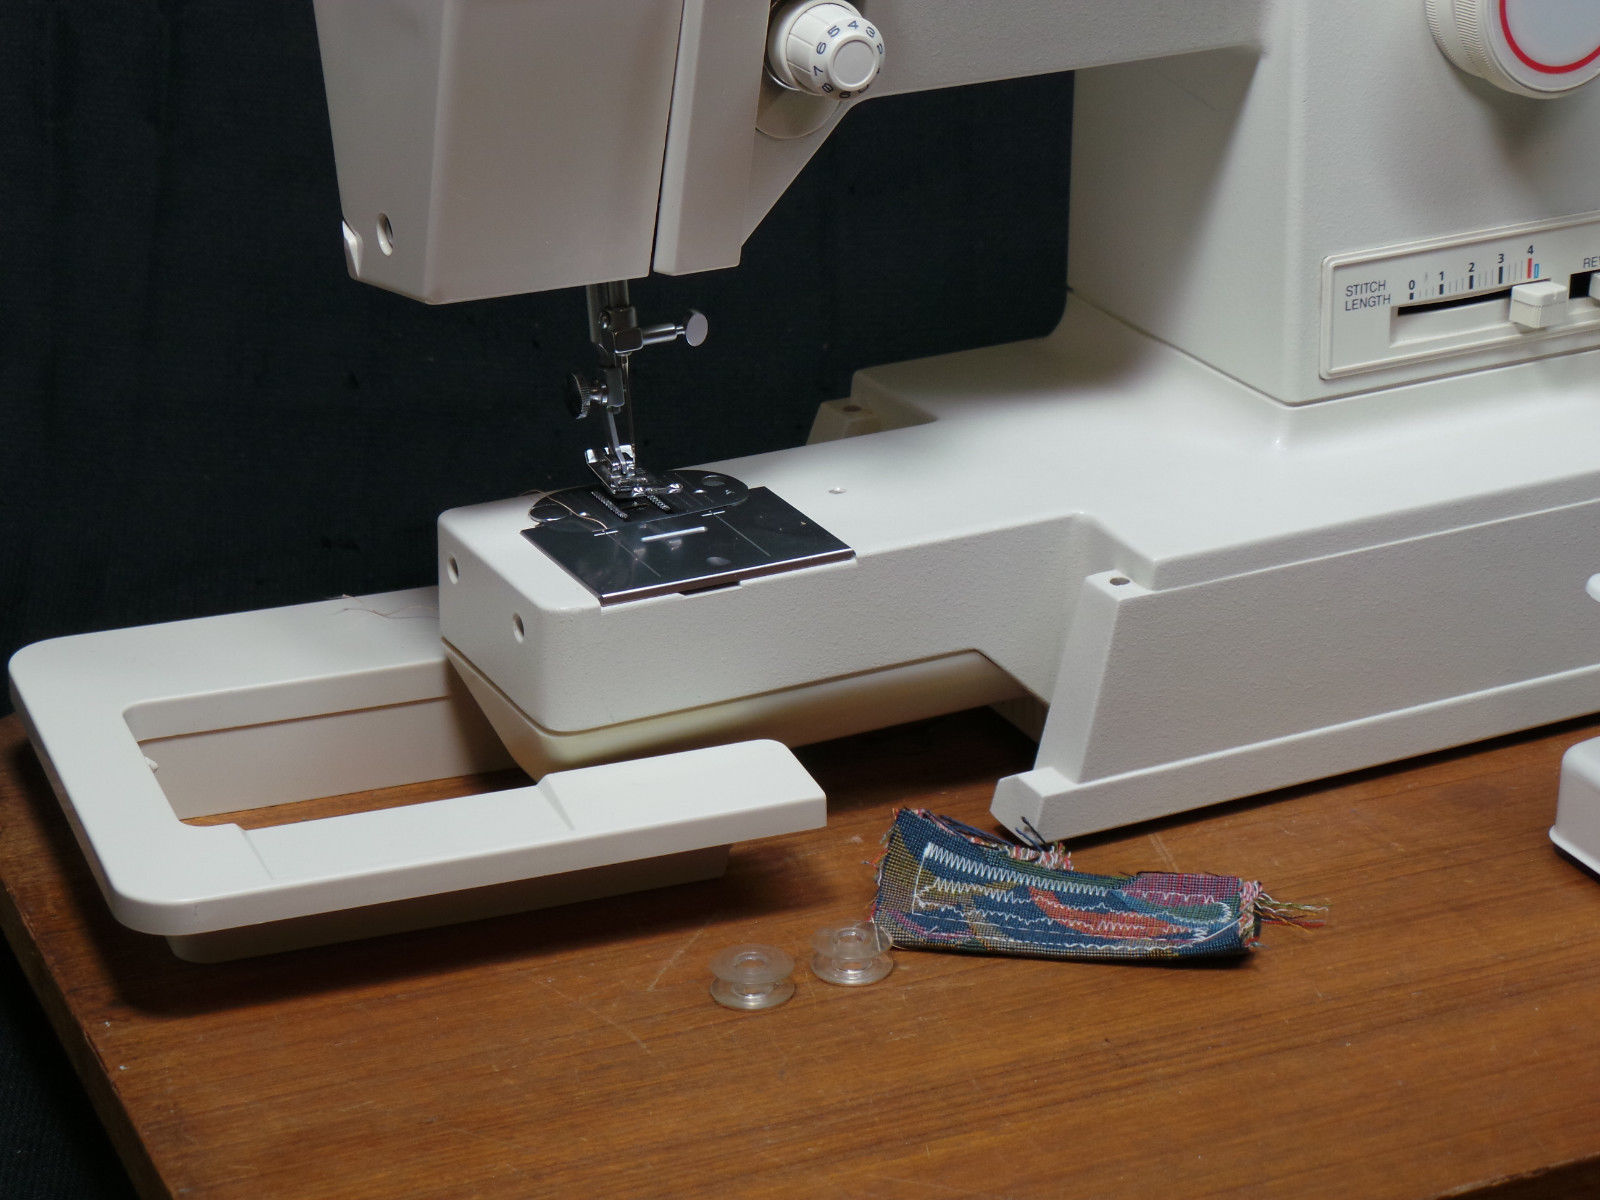 Singer Merritt 4552 Sewing Machine Portable And 12 Similar Items Necchi Supernova Threading Diagram Vintage Upholstery Denim Light Leather Svcd